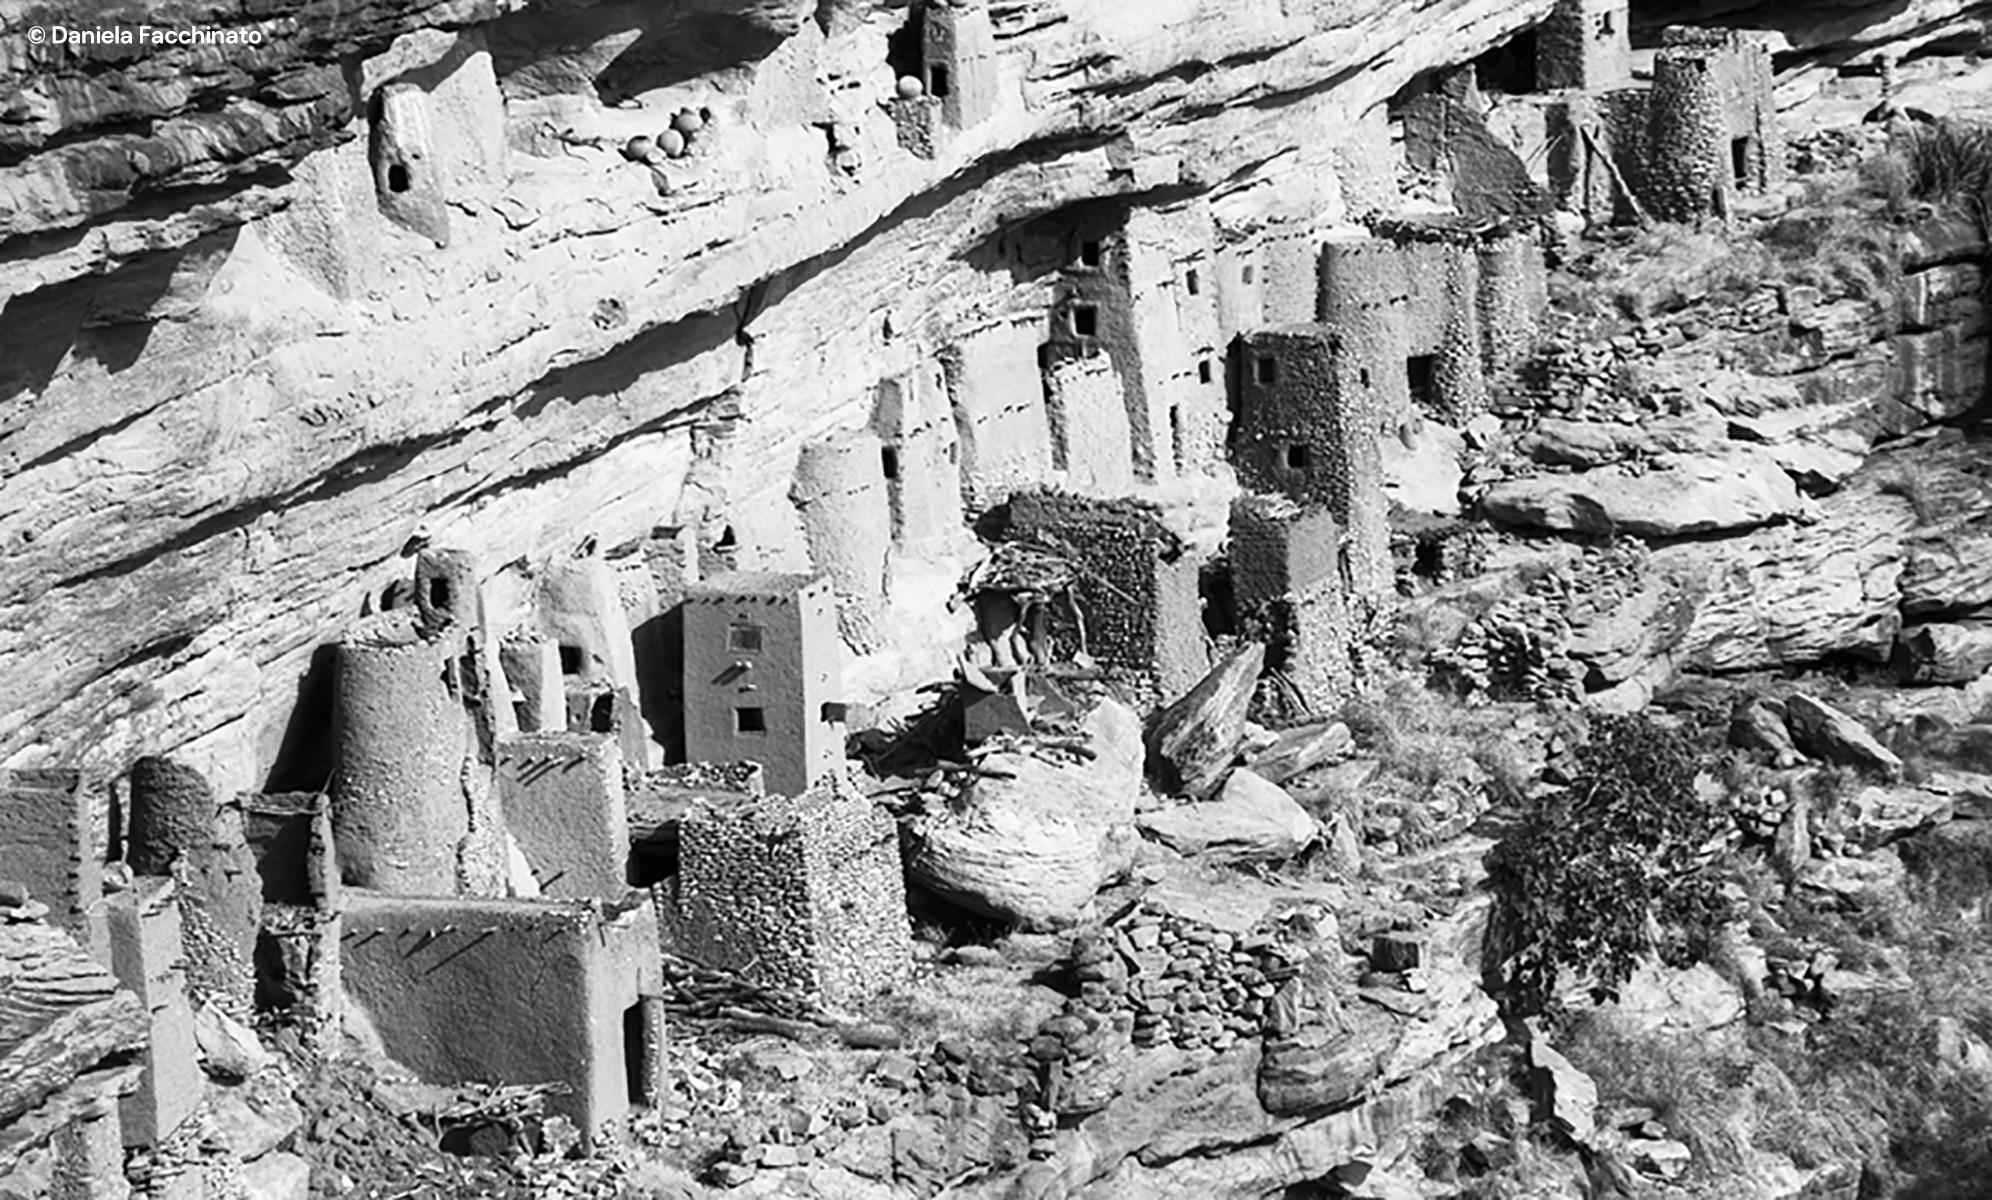 Dogon land, 1989. The cliff of Bandiagara